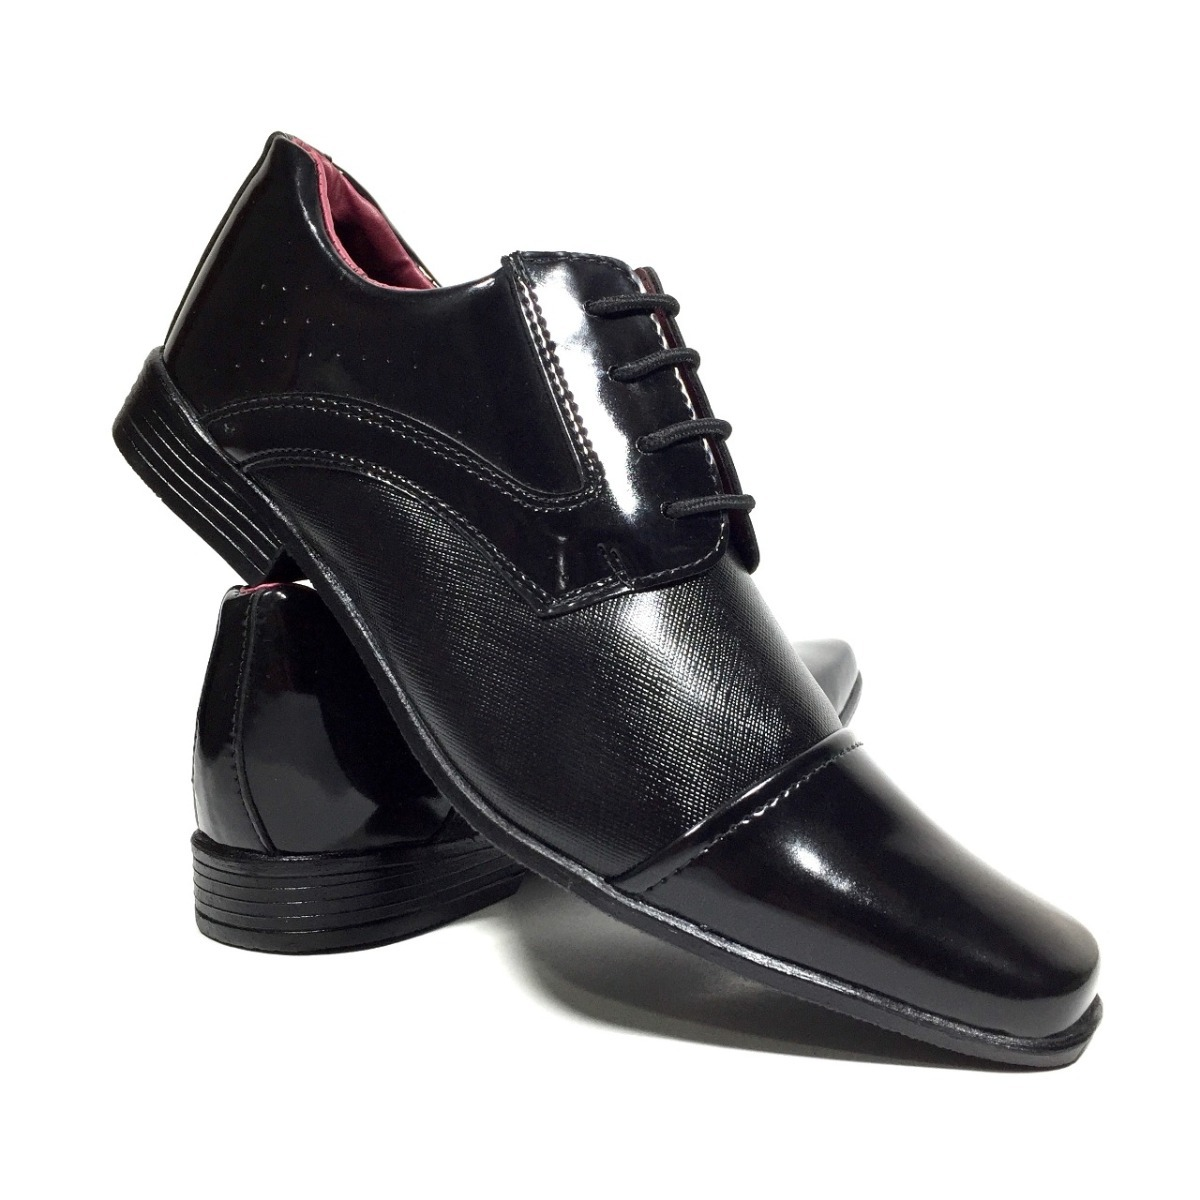 22128d9426 sapato social masculino para casamento muito barato preto e. Carregando  zoom.